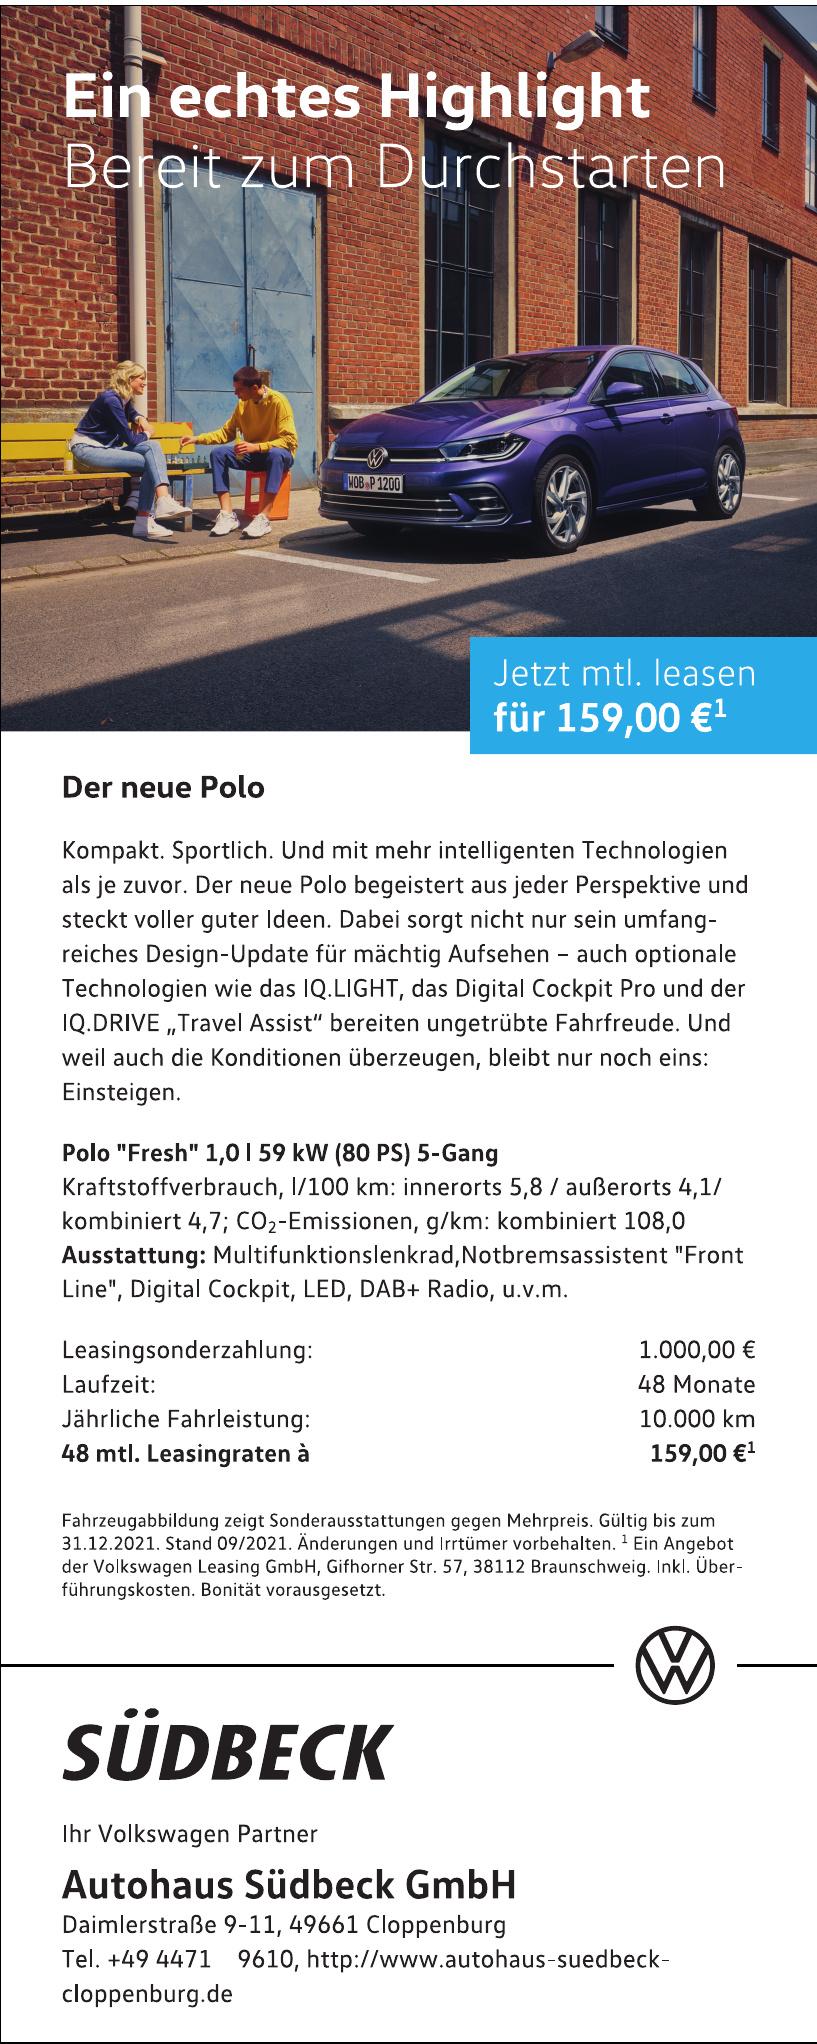 Autohaus Südbeck GmbH